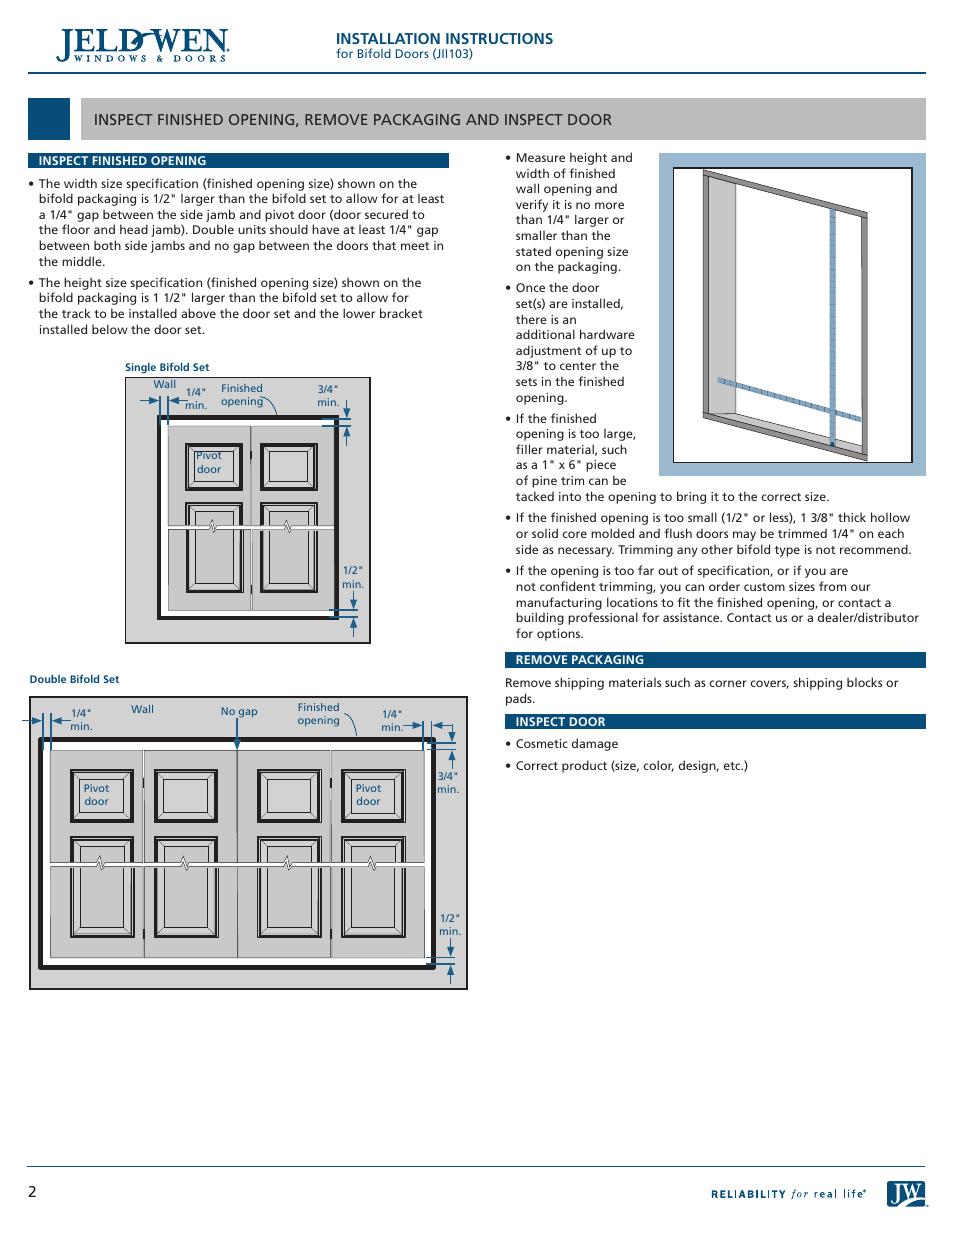 Installation Instructions  Jeldwen Jii103 Bifold Doors